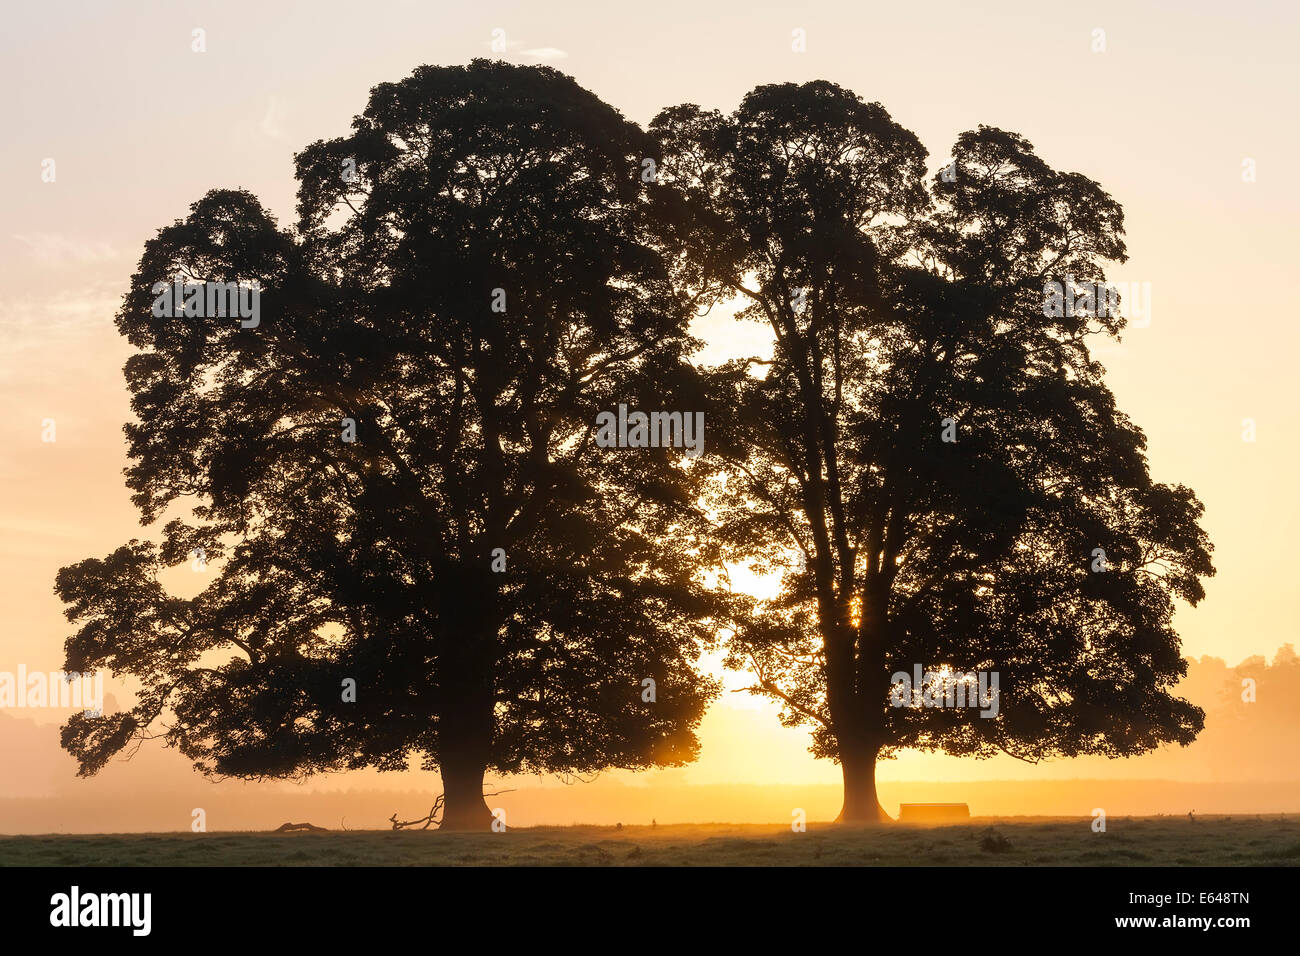 Sunrise, Usk Valley, South Wales, UK Stockbild